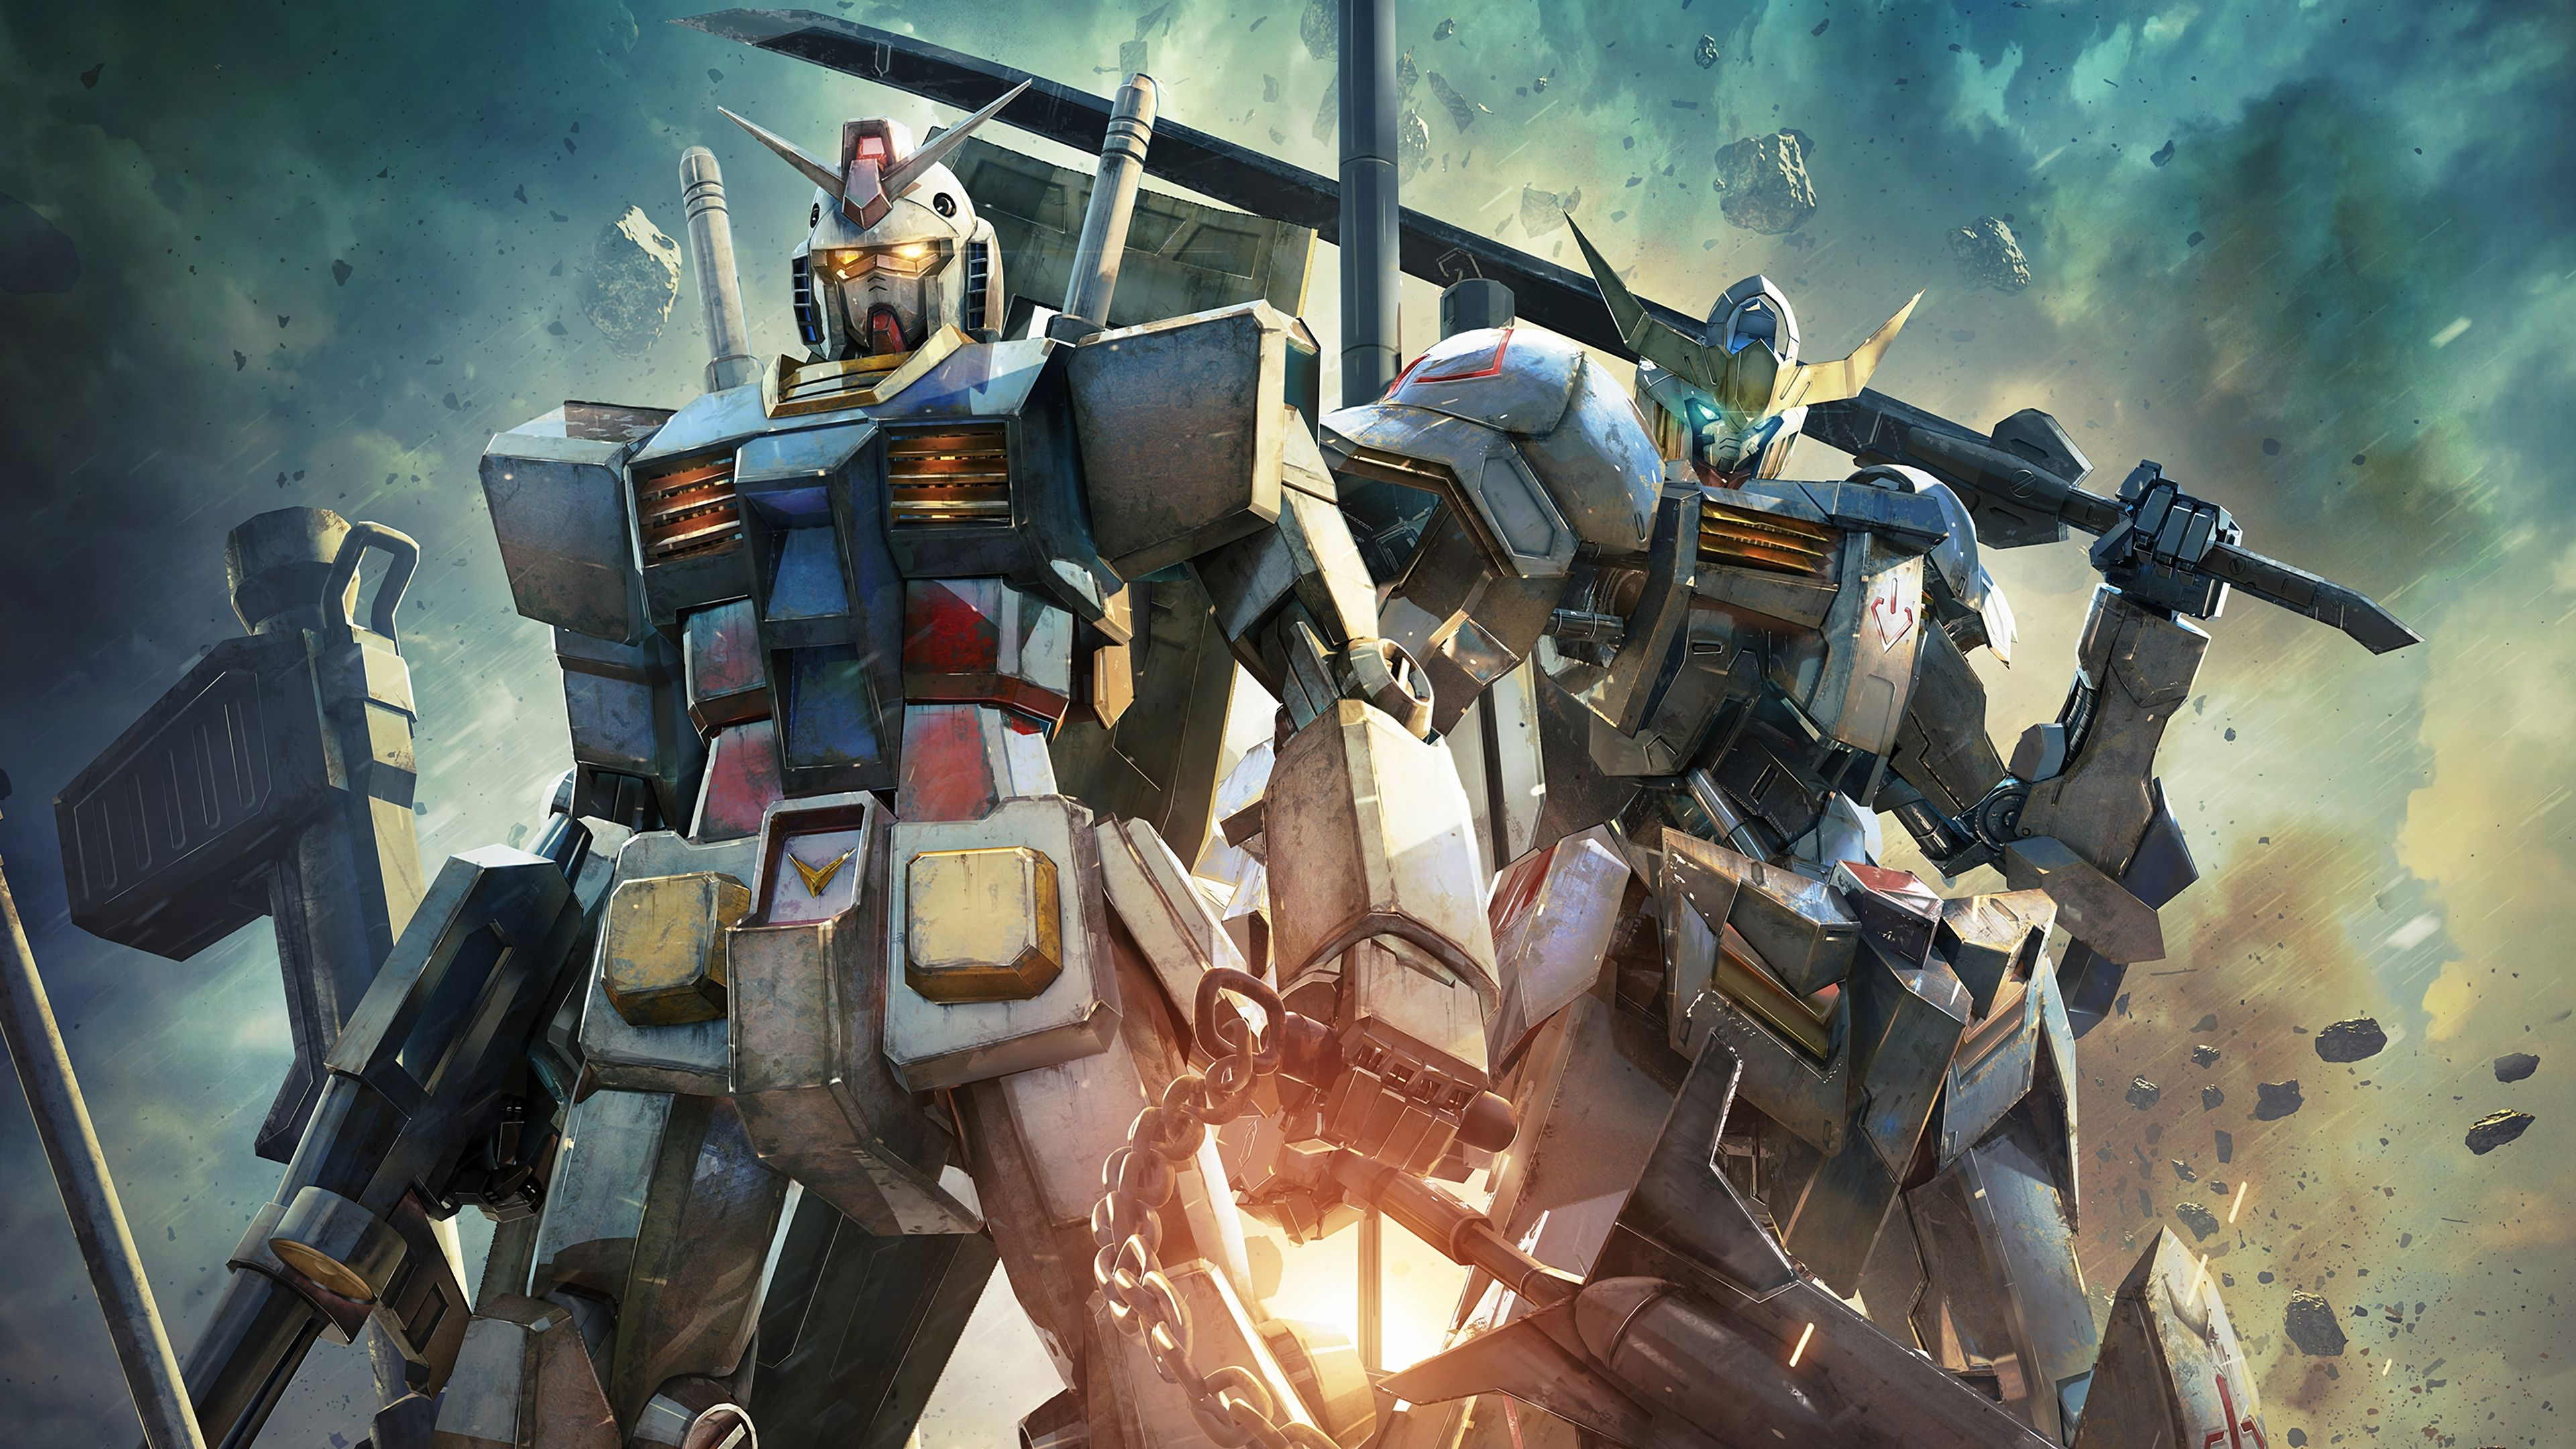 Nice Gundam Versus 4k Playstation 4 Ps4 Game 3840x2160 Wallpaper Gundam Wallpapers Anime Wallpaper Gundam